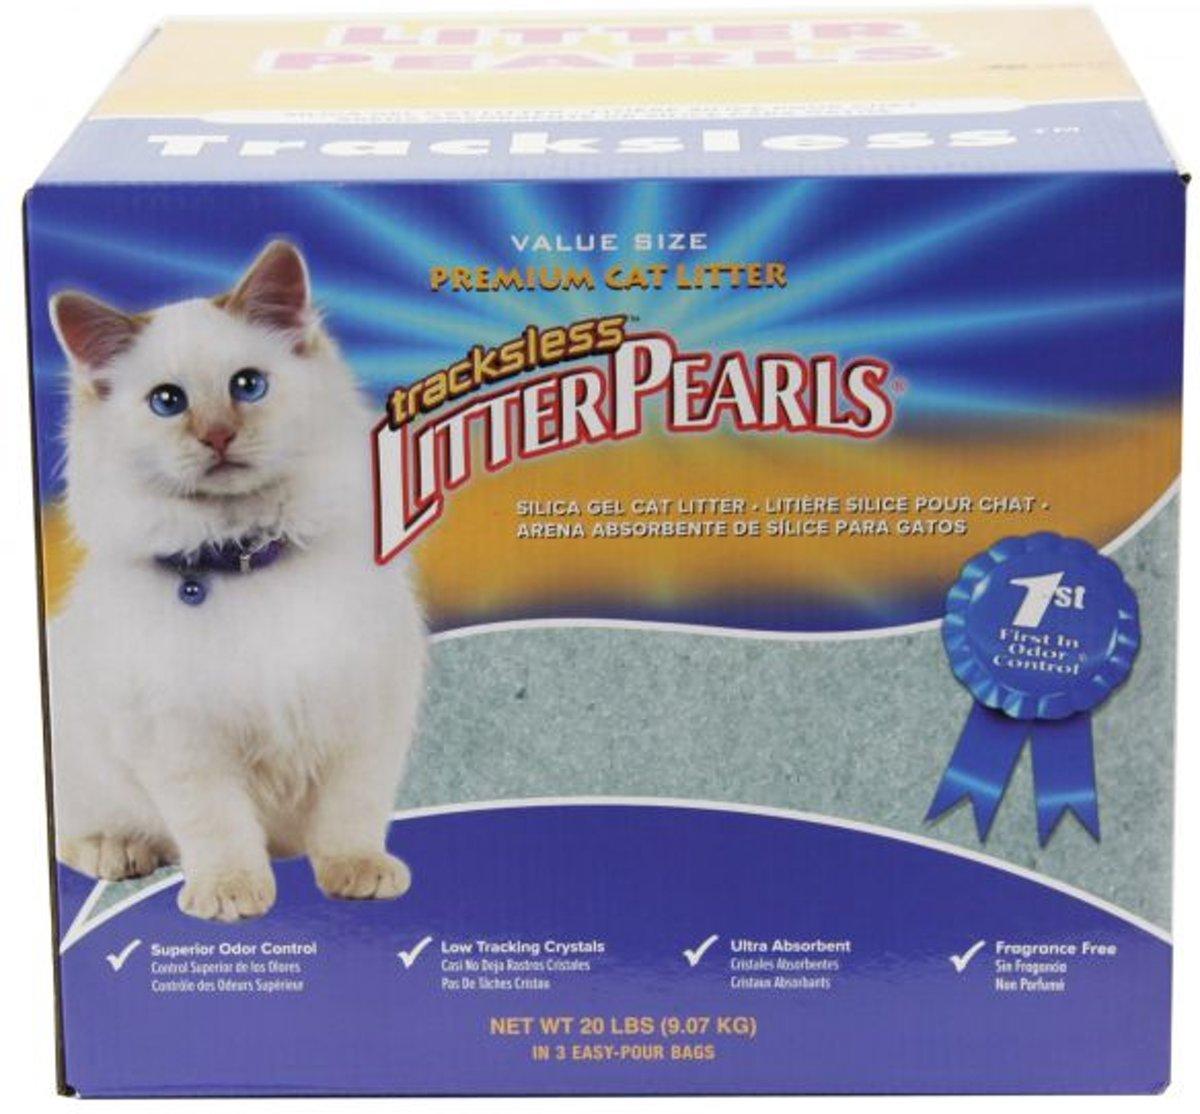 Crystal clear litter pearls kattenbakvulling